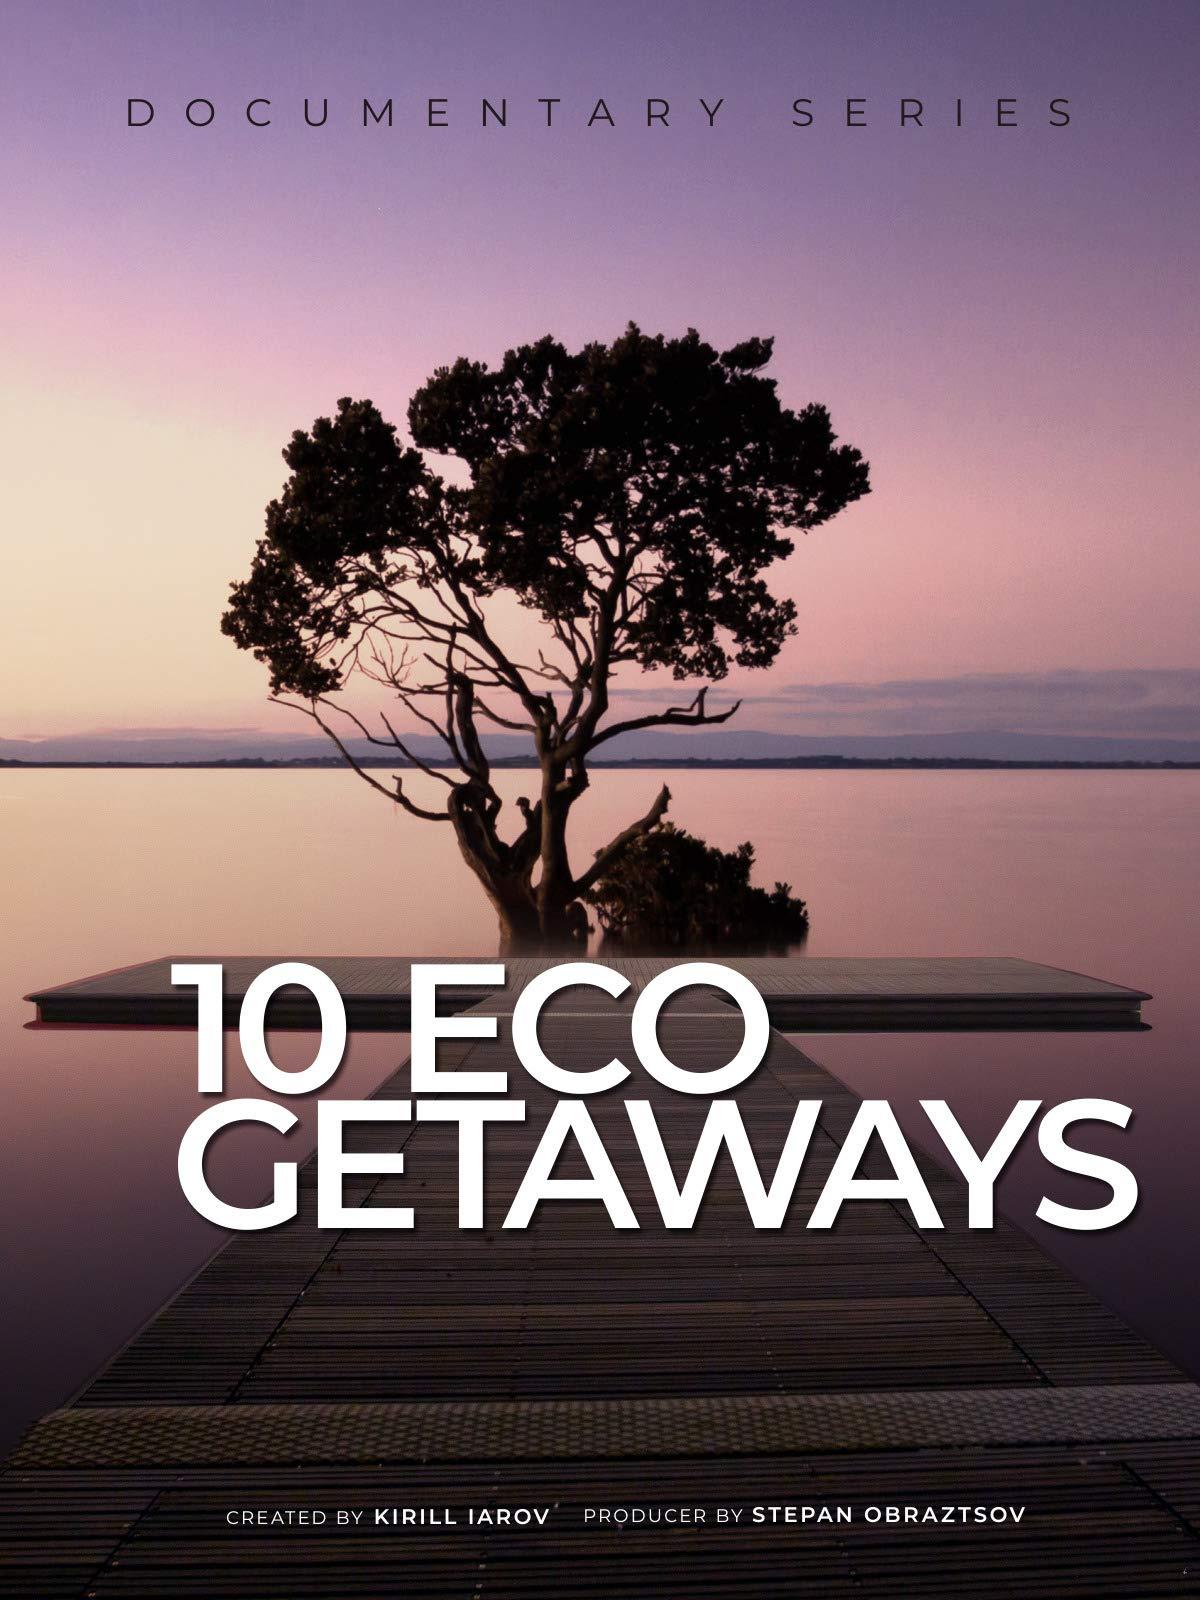 10 Eco Getaways